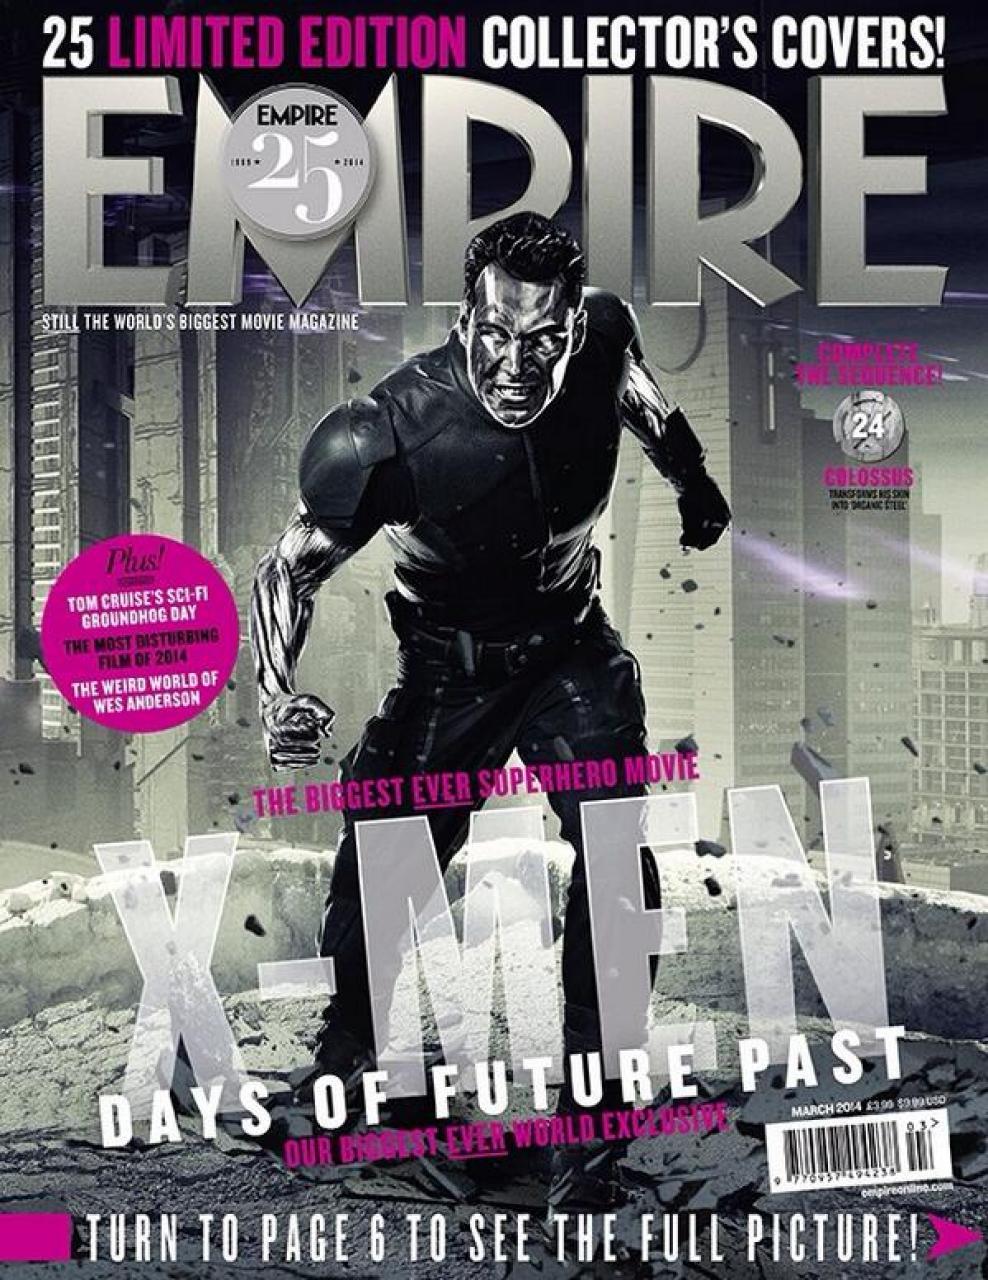 Empire Xmen Days Of Future Past Covers (8)